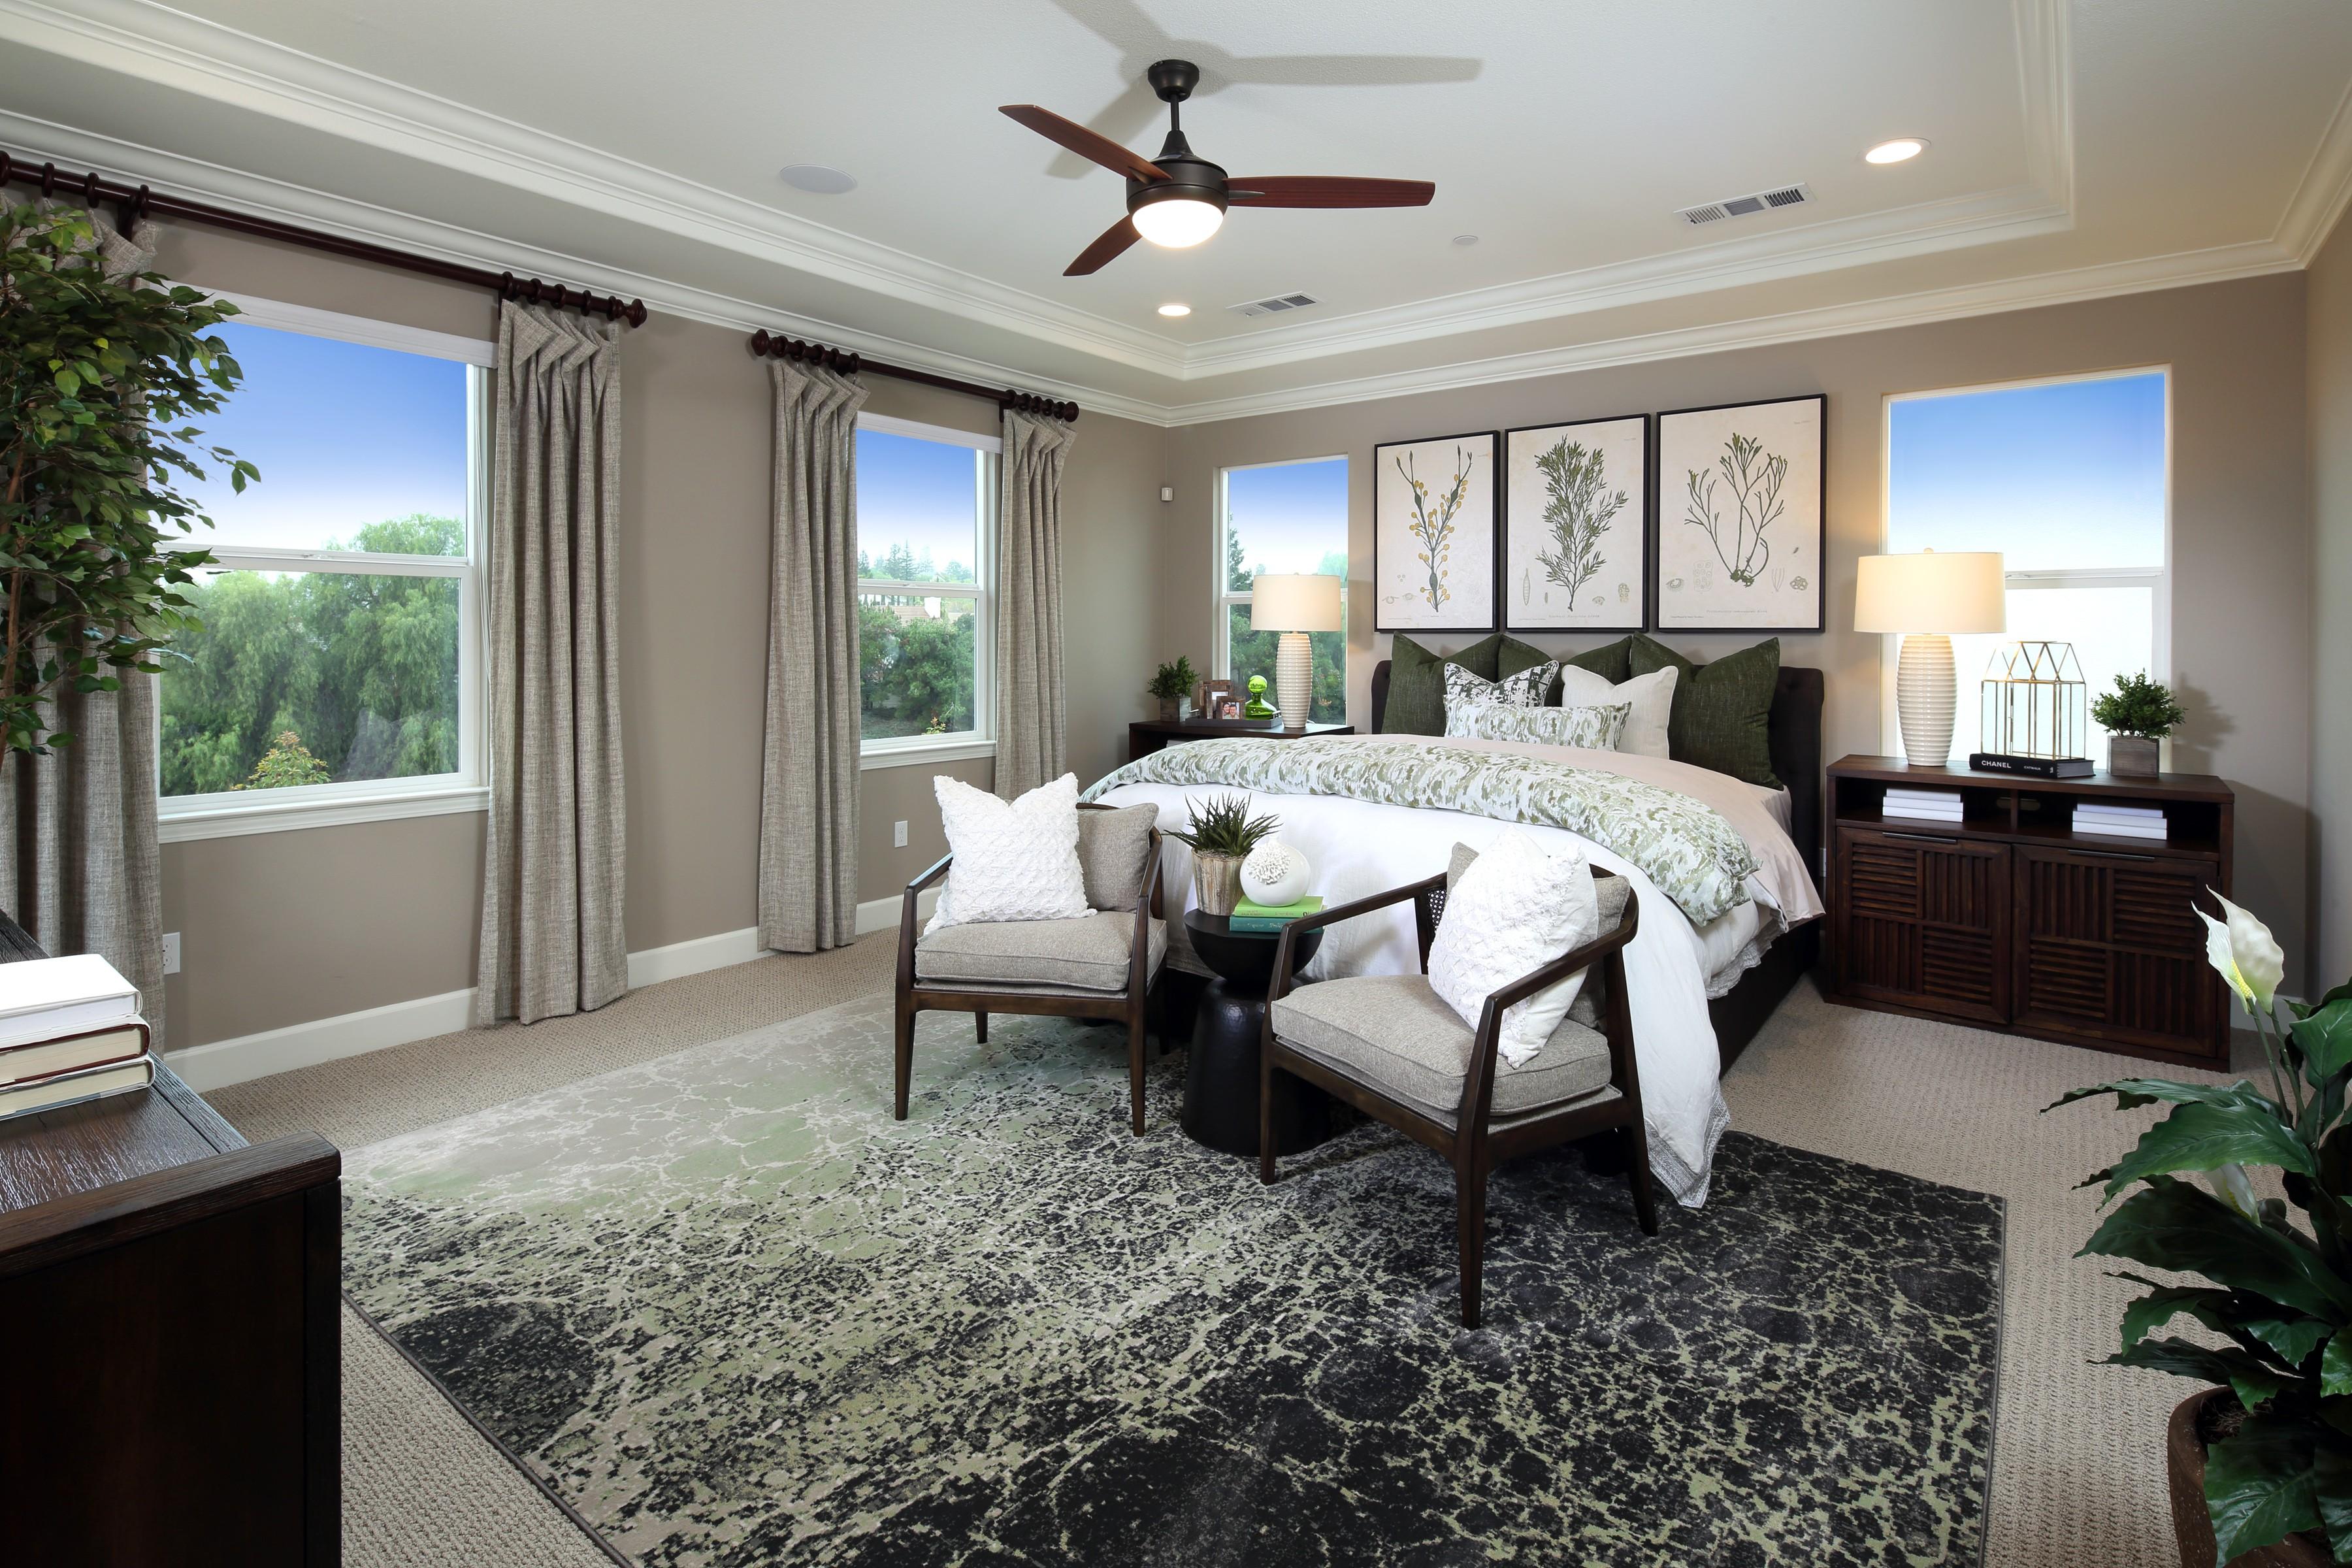 Bedroom interior   Elite Builder Services